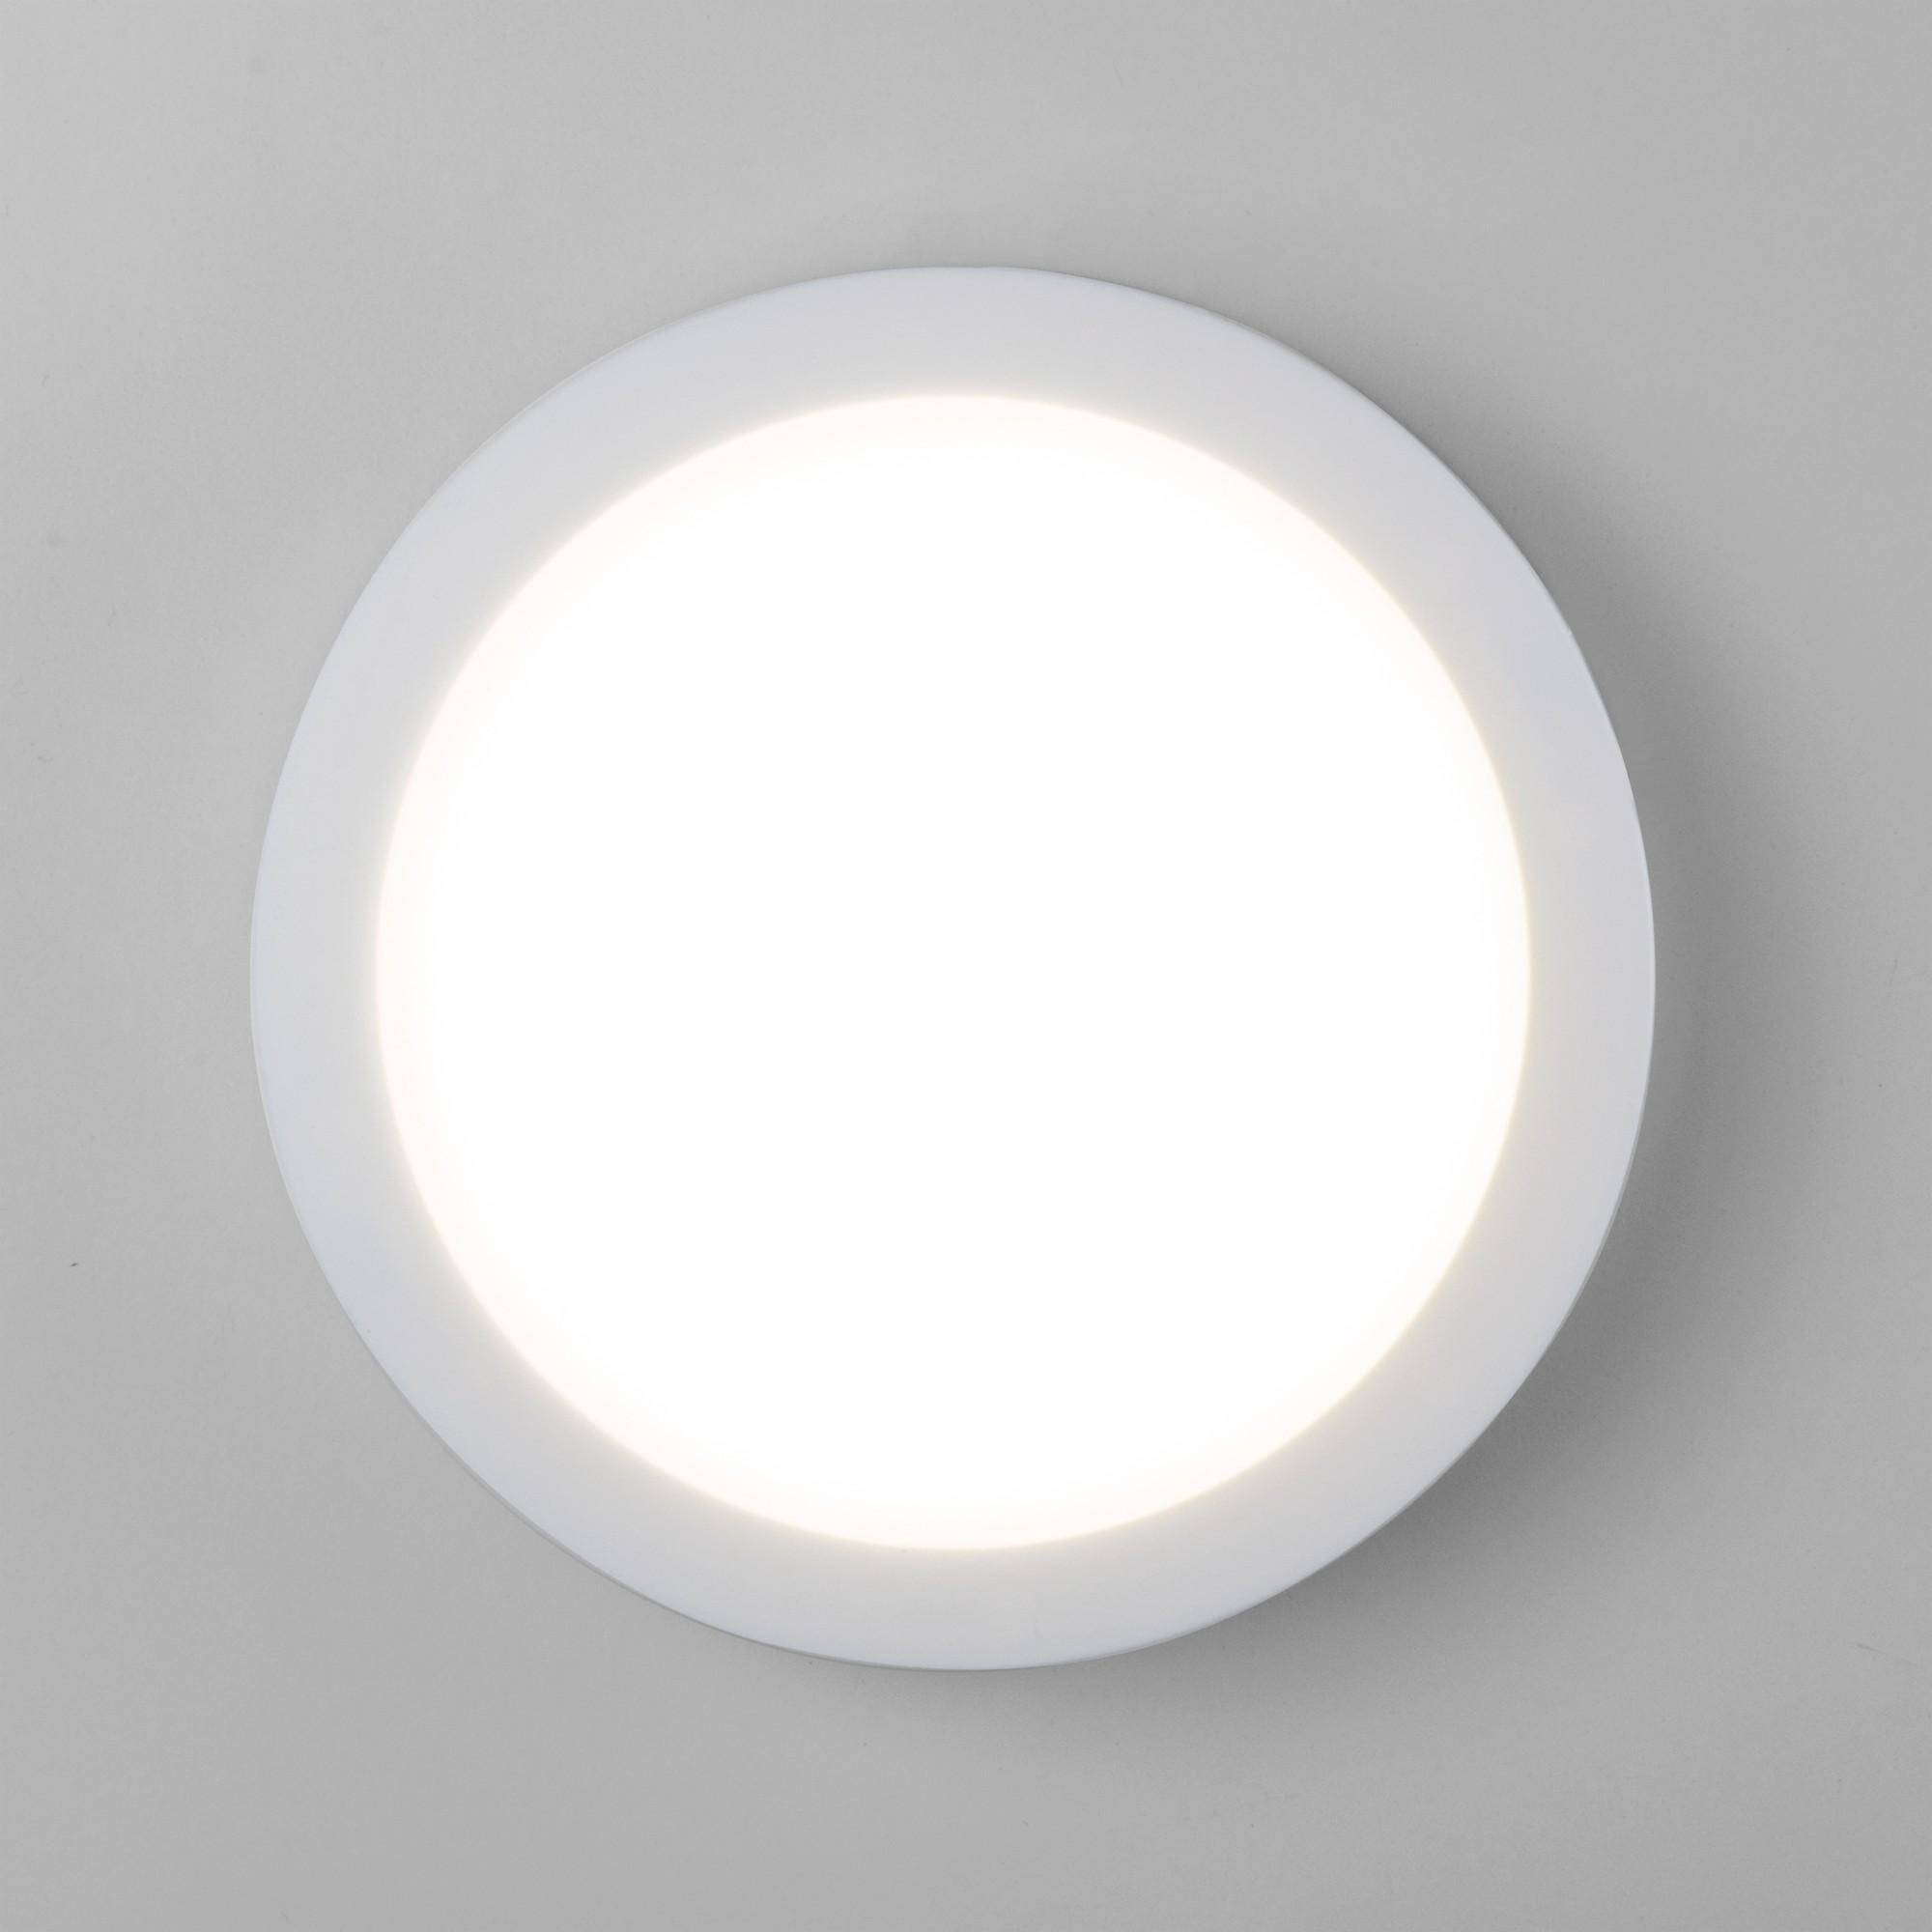 LTB51 LED Светильник 15W 6500K Белый